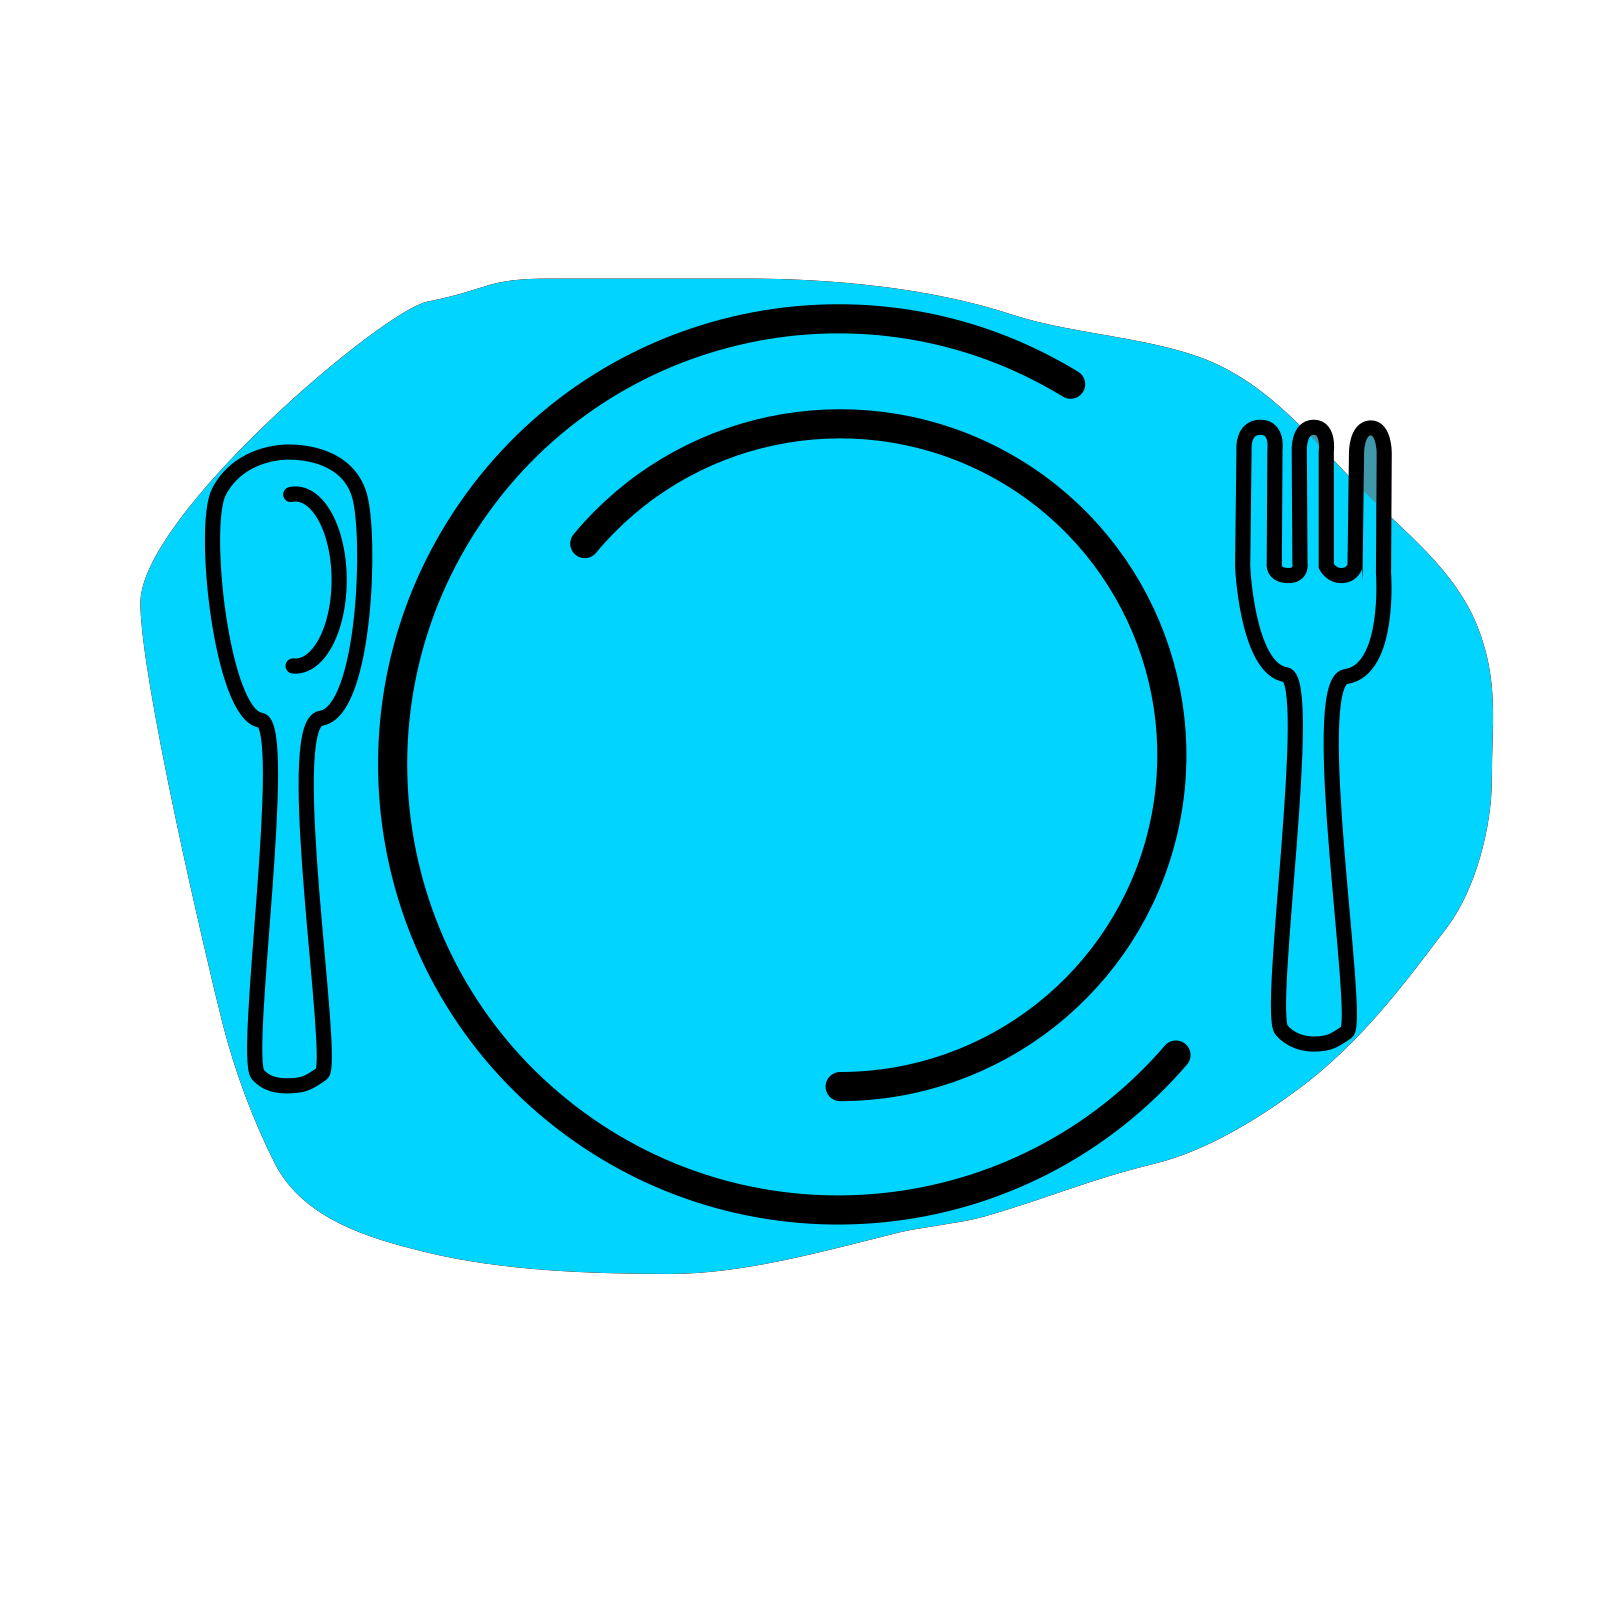 Food Service Database